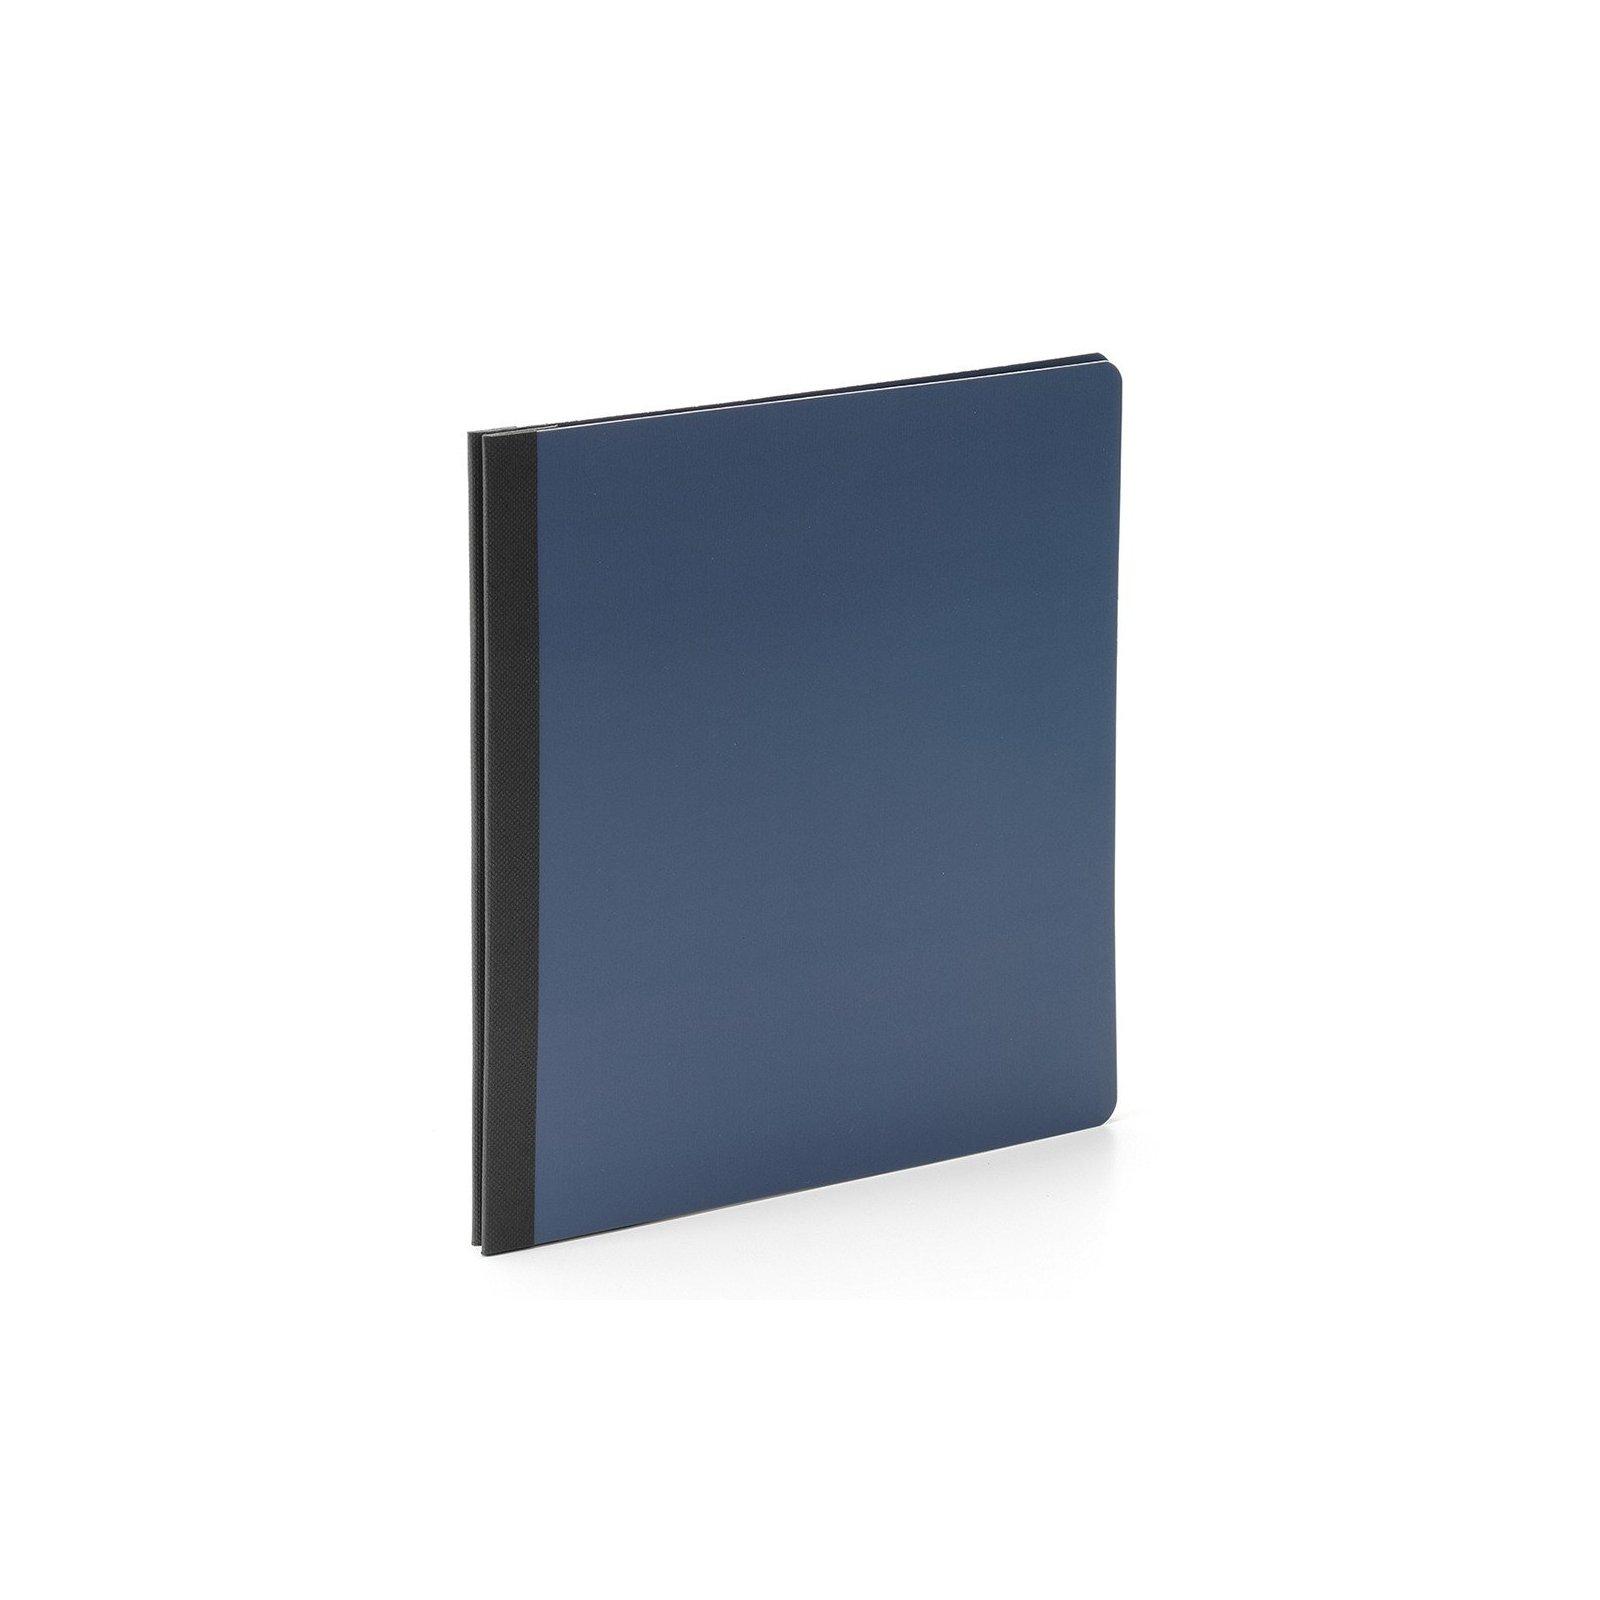 Flipbook - 15x20 - Bleu marine - Simple Stories